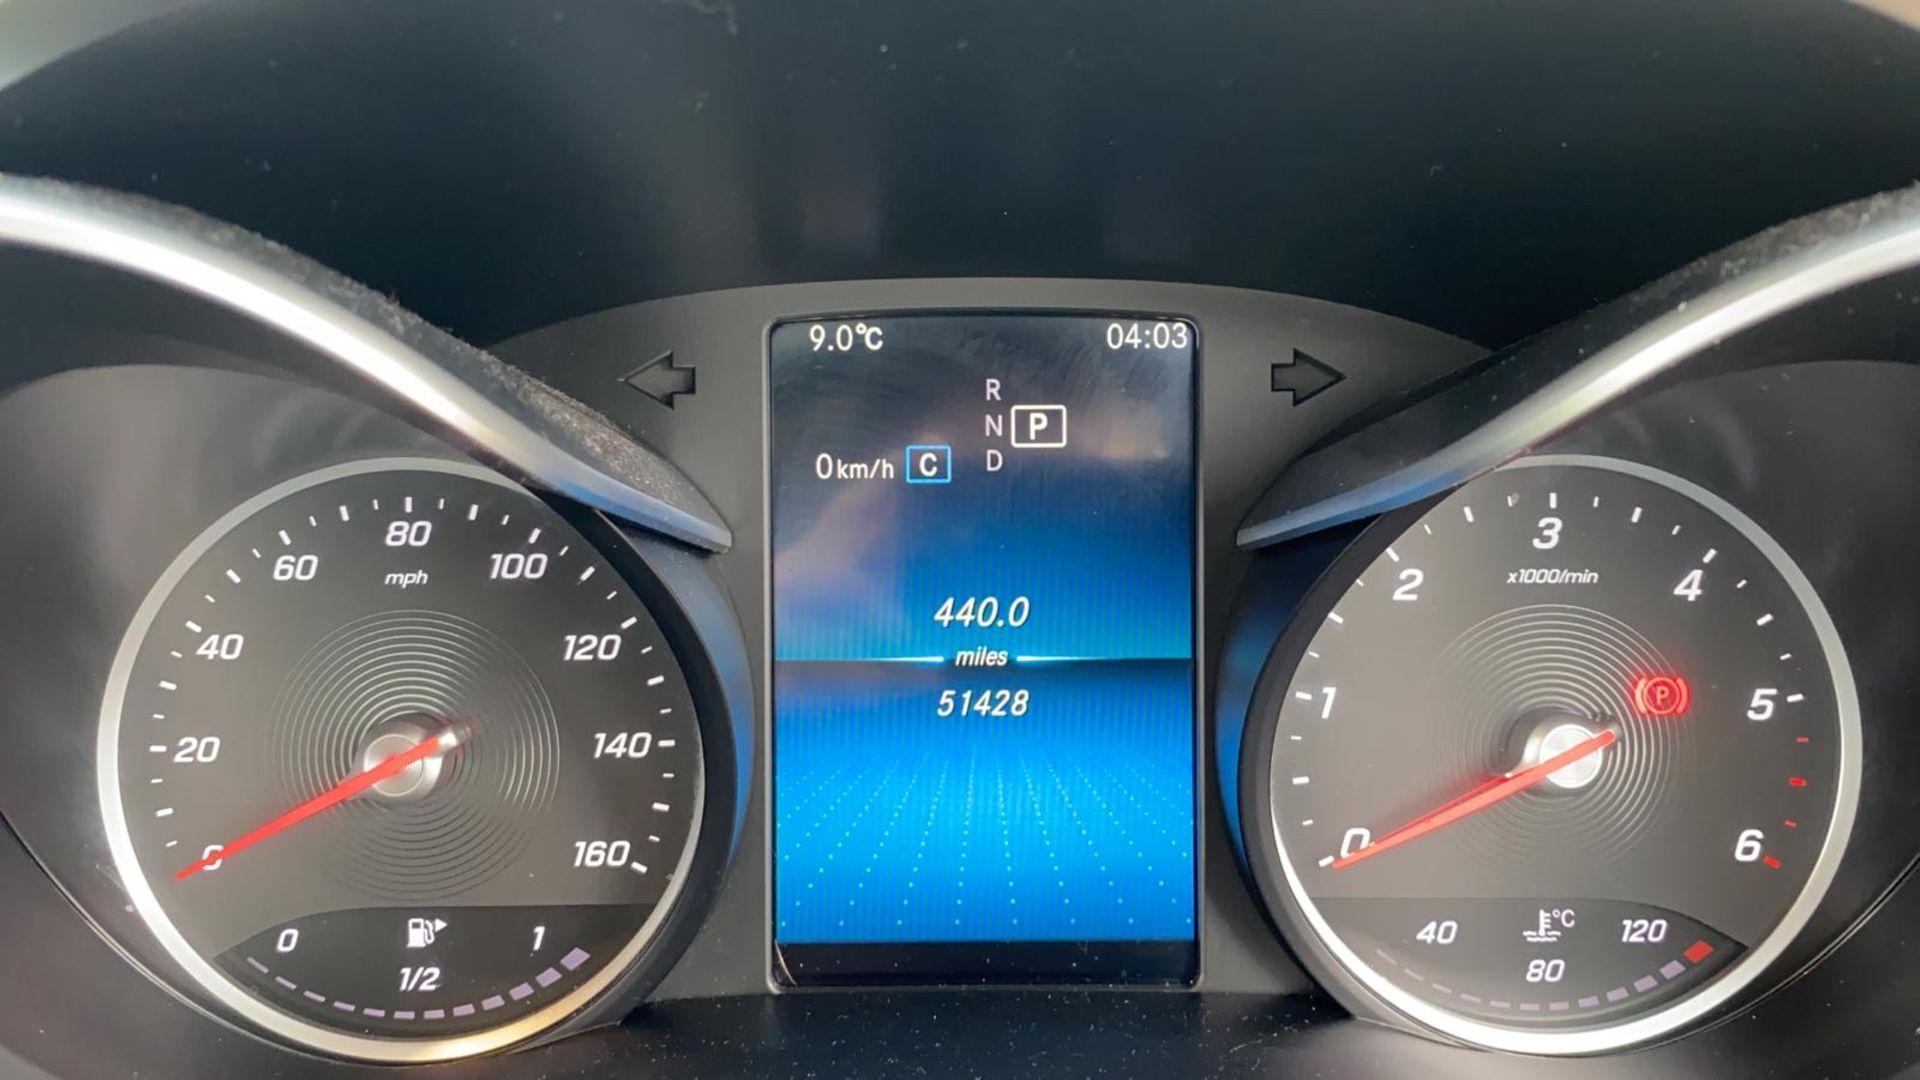 (Reserve Met) Mercedes C220d Sport - 9G Tronic Auto - 188BHP - 2019 Reg - Reversing Cam - Sat Nav - - Image 7 of 7